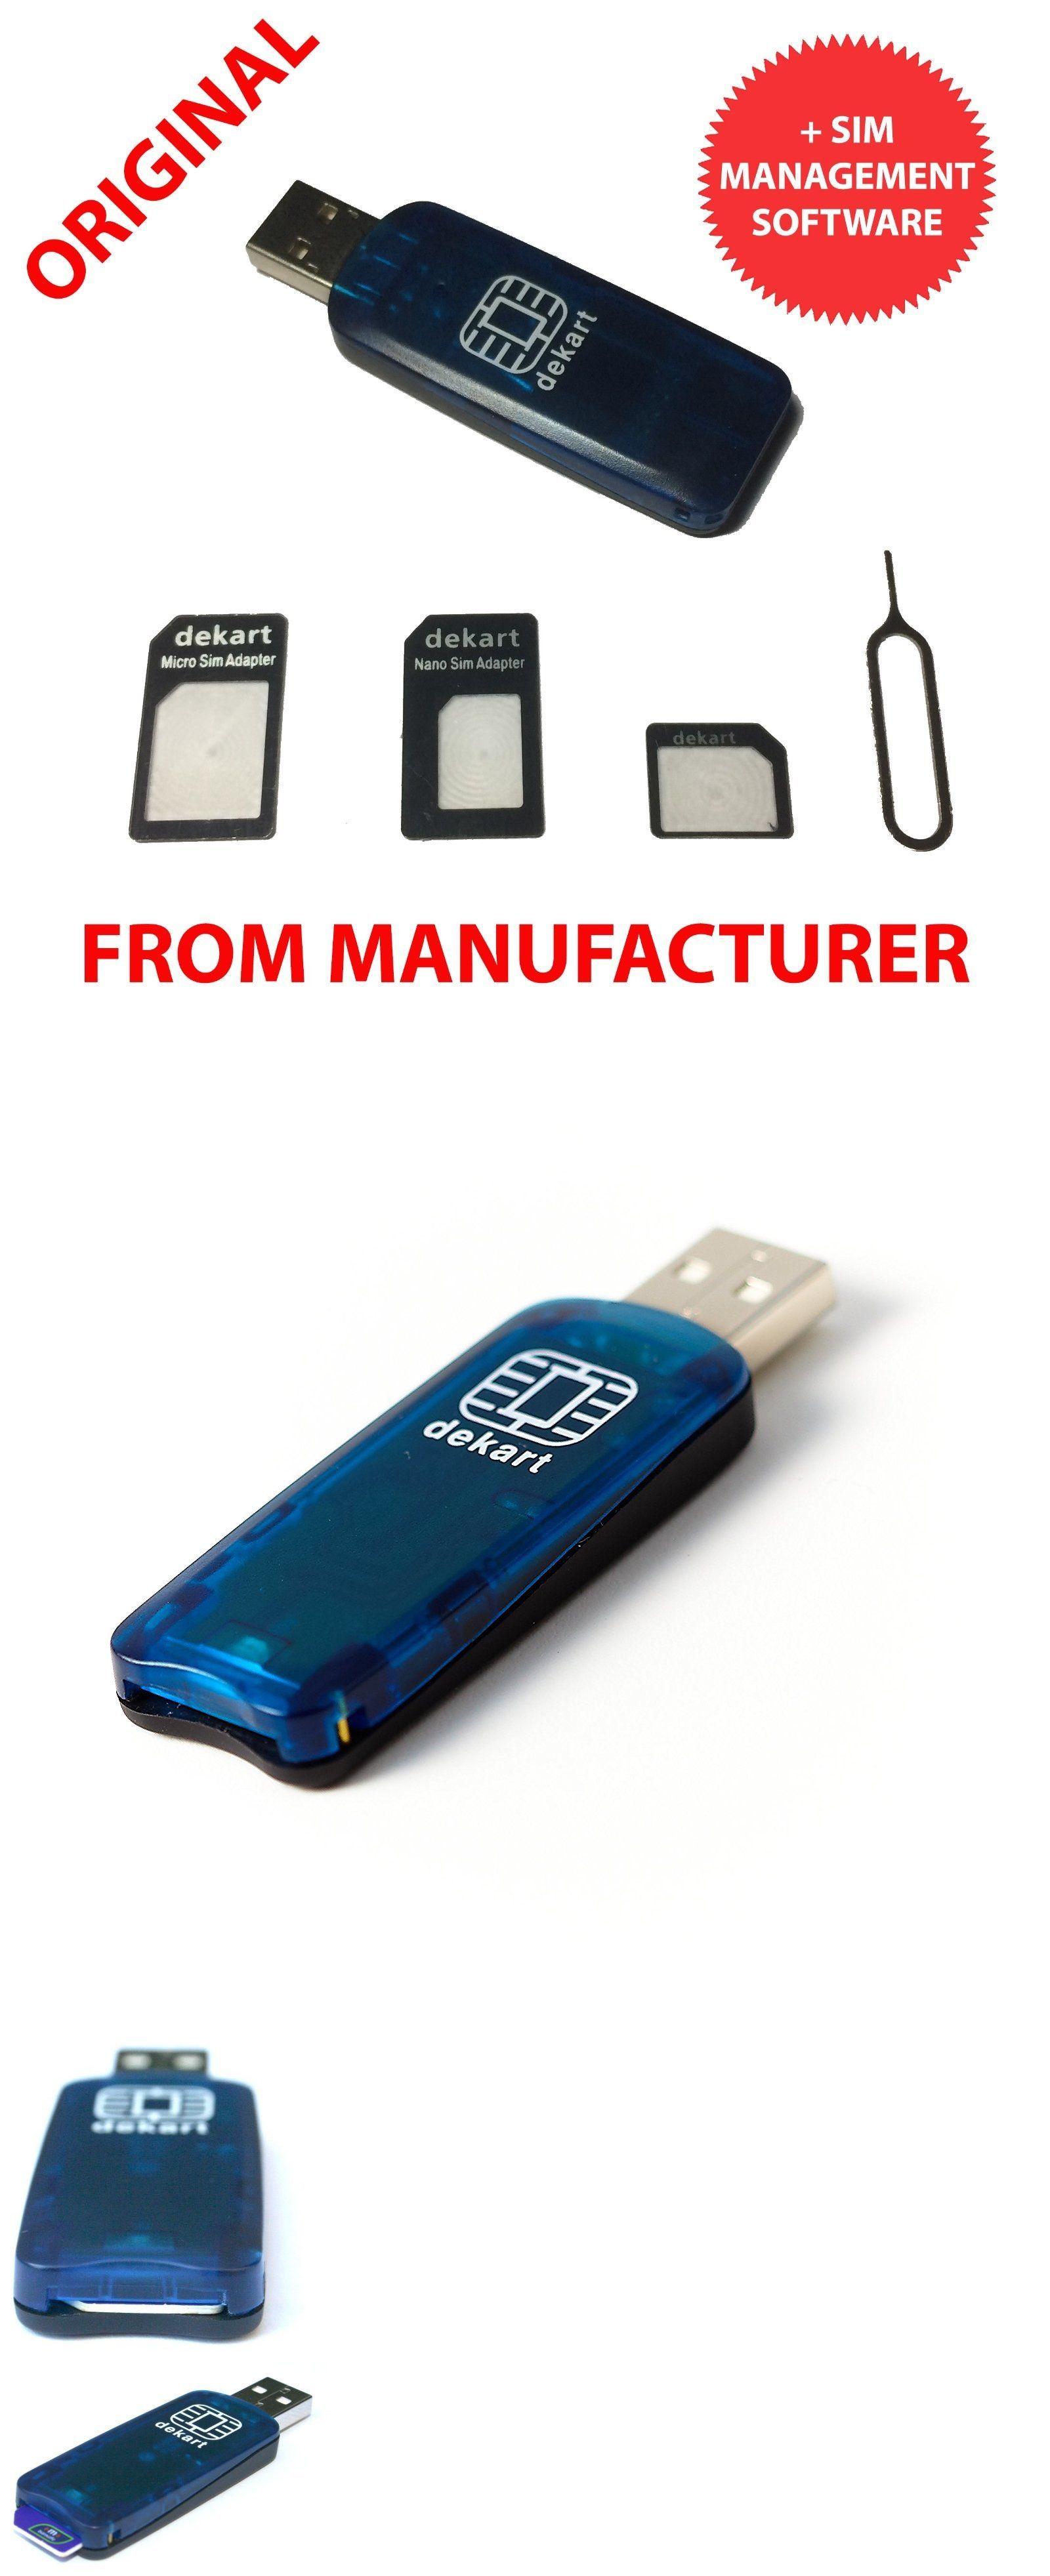 babiwa series No.20 MicroSD to MicroSD Extension Cable TF memorycard Extender